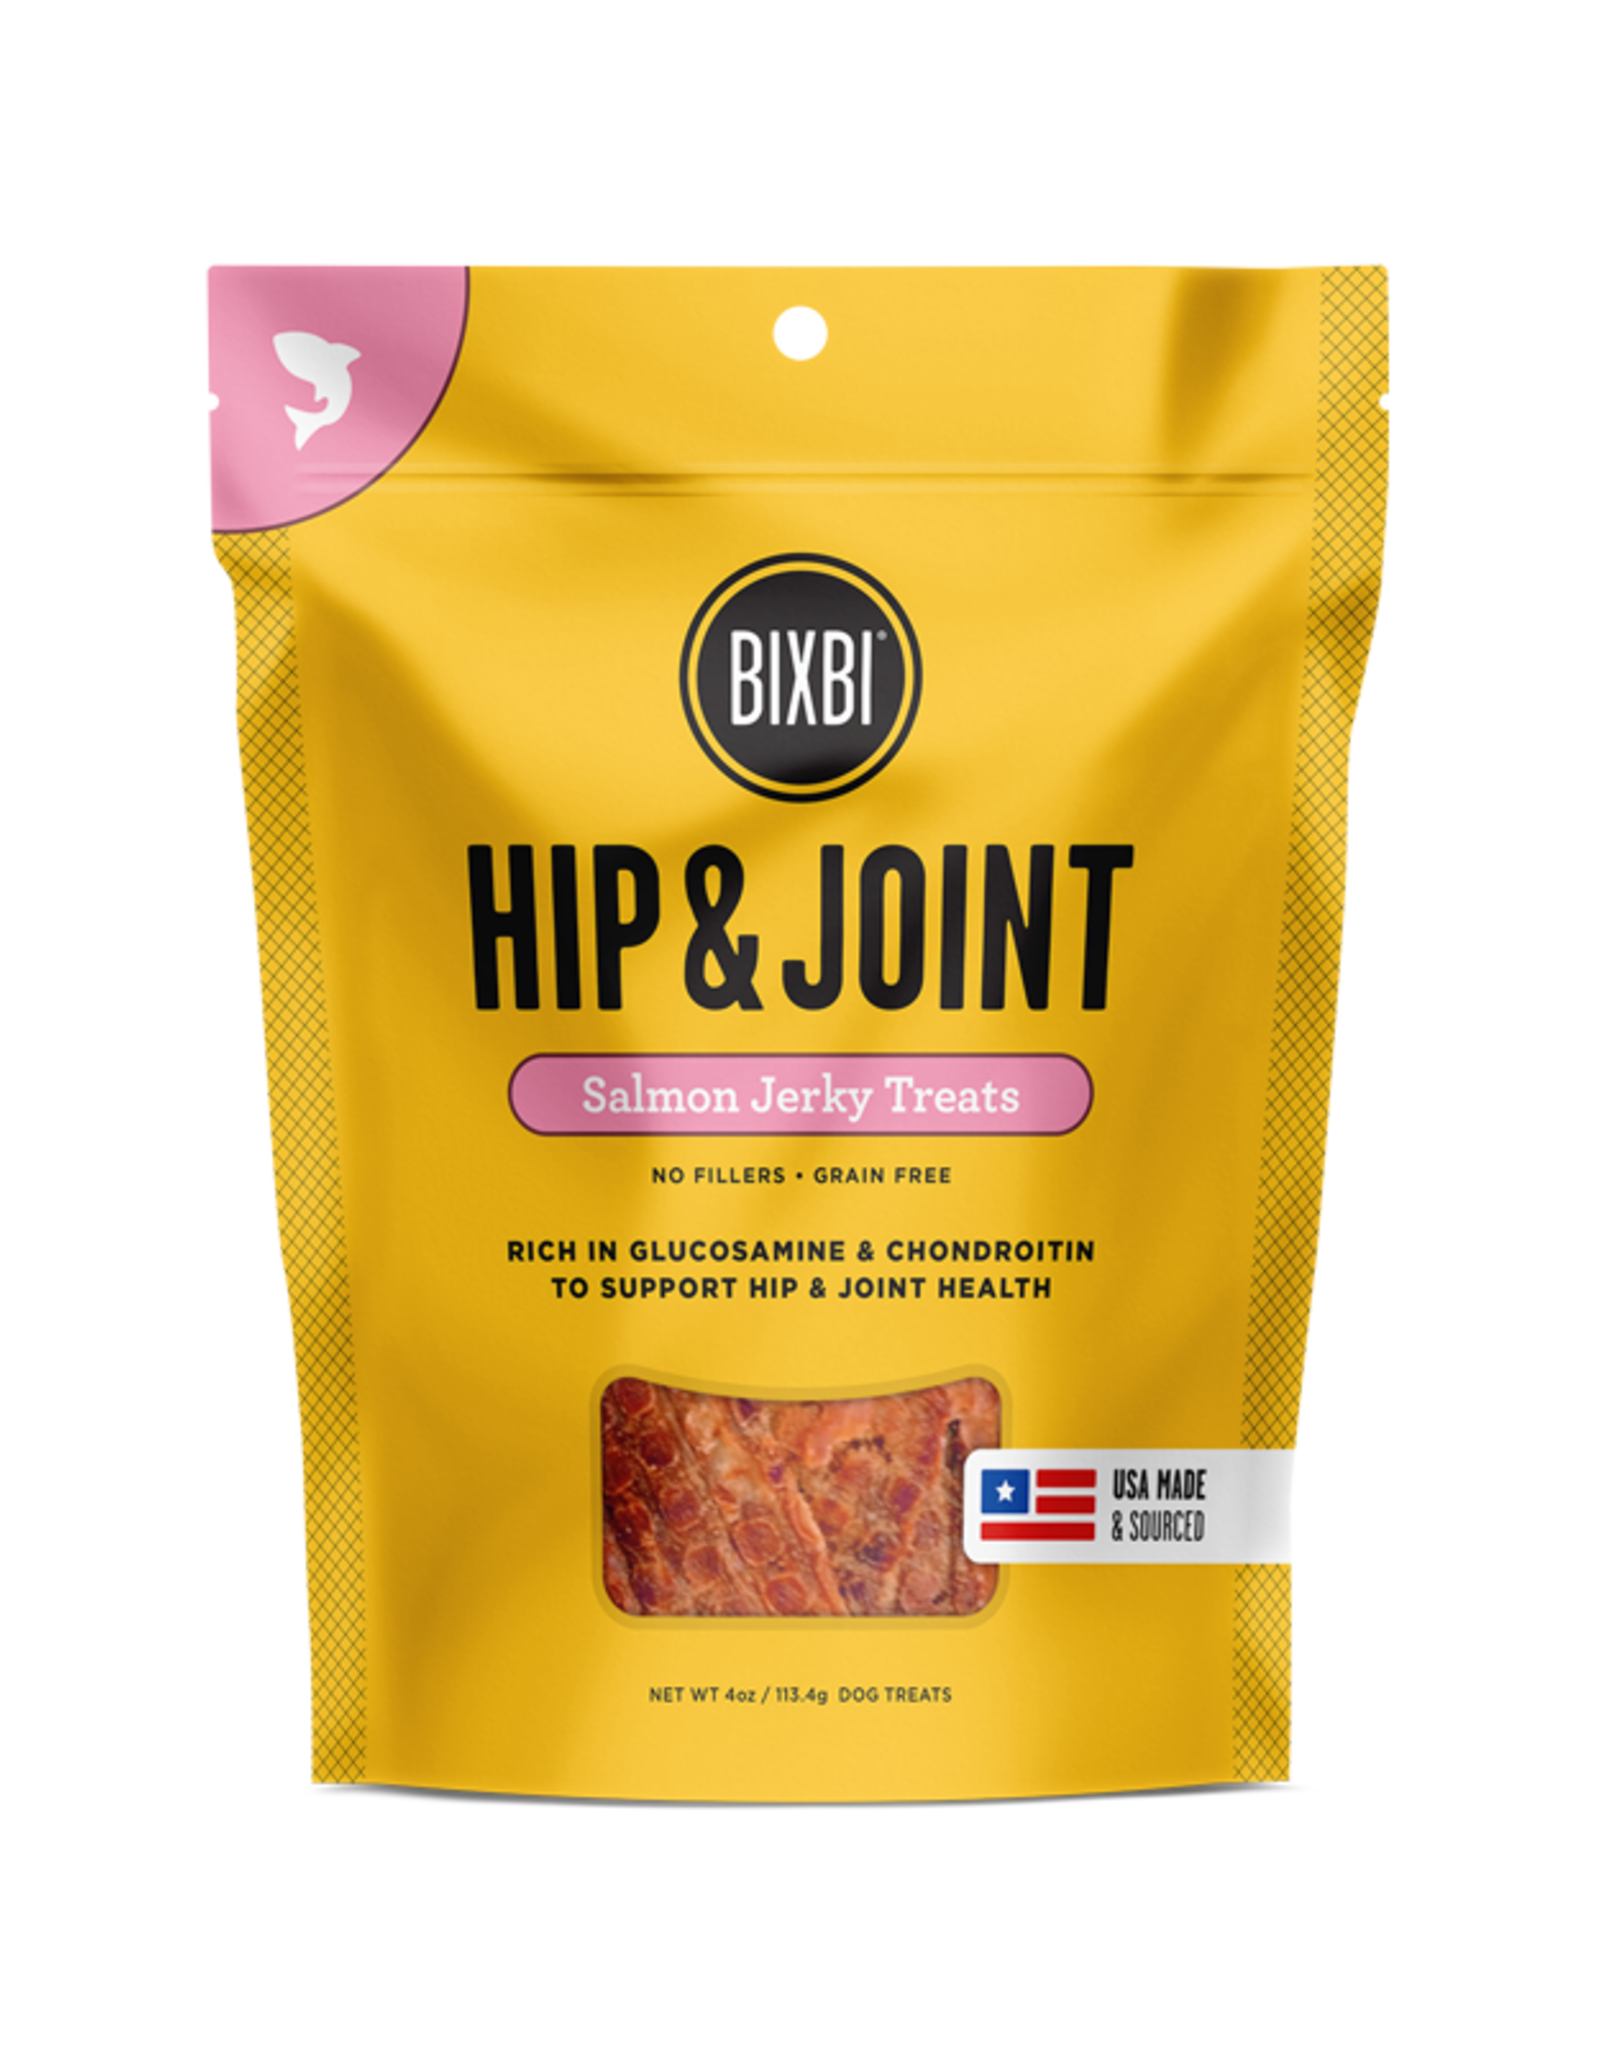 Bixbi Bixbi Hip & Joint Salmon Jerky